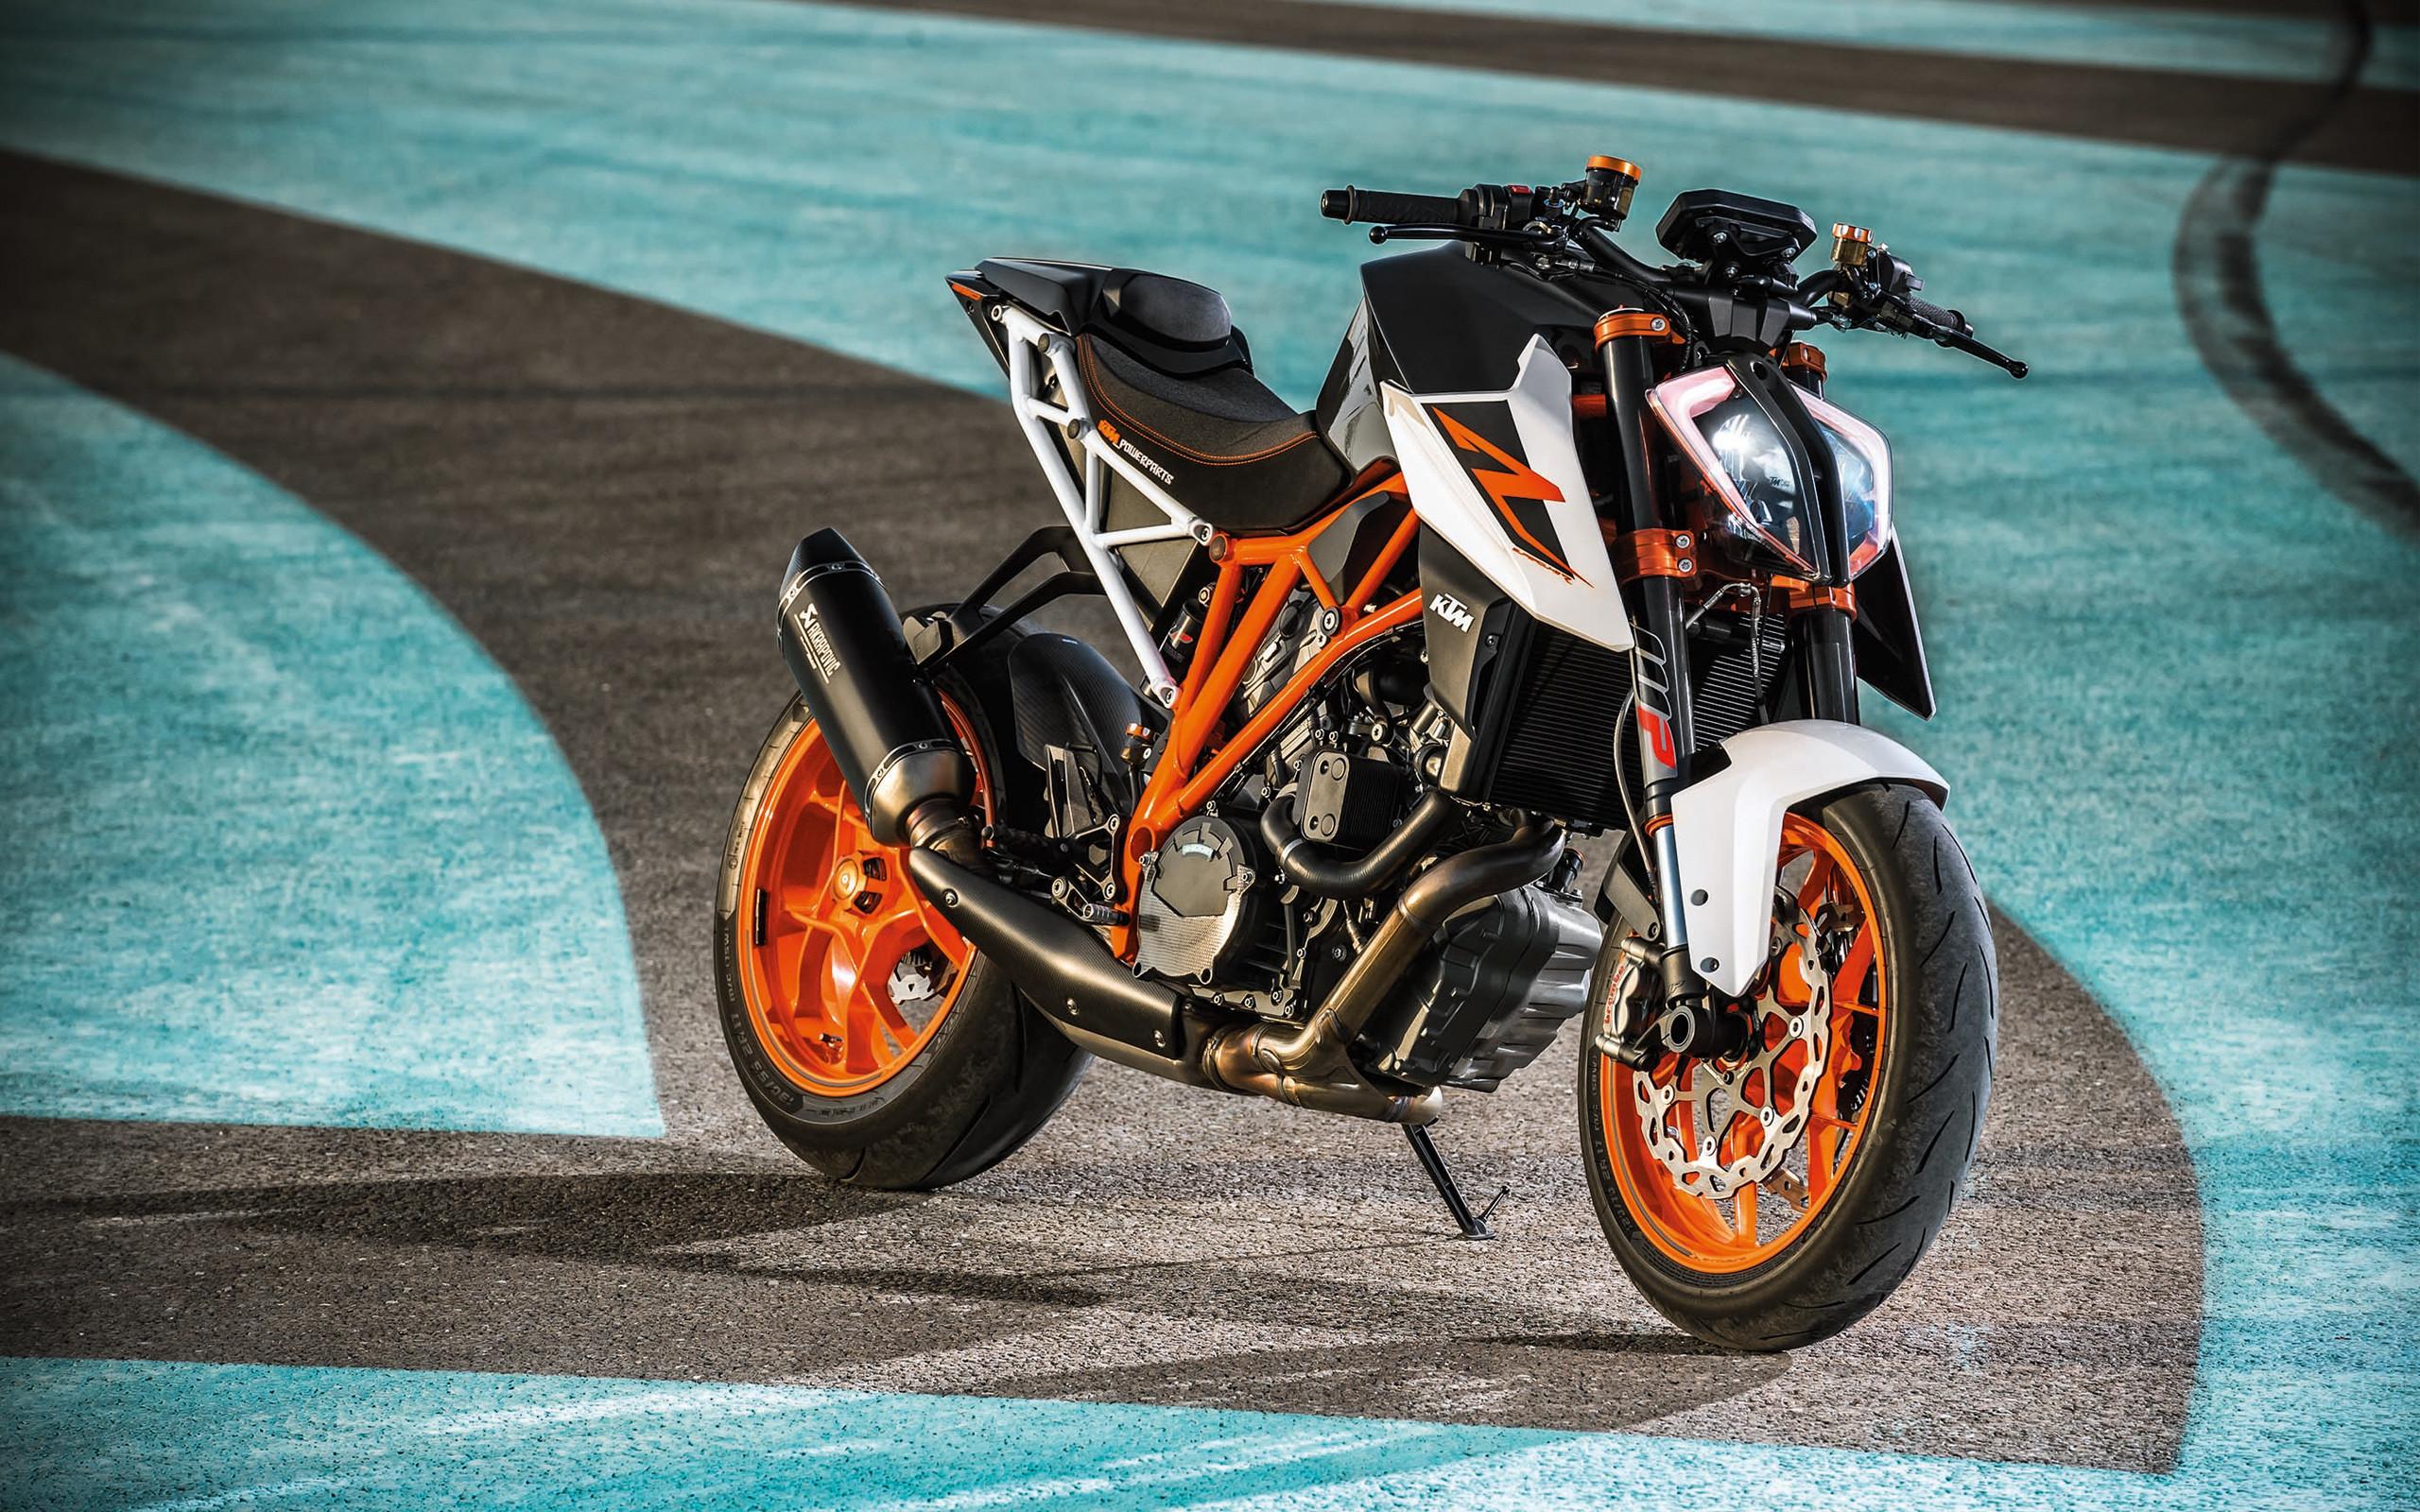 KTM 1290 Super Duke R 2017